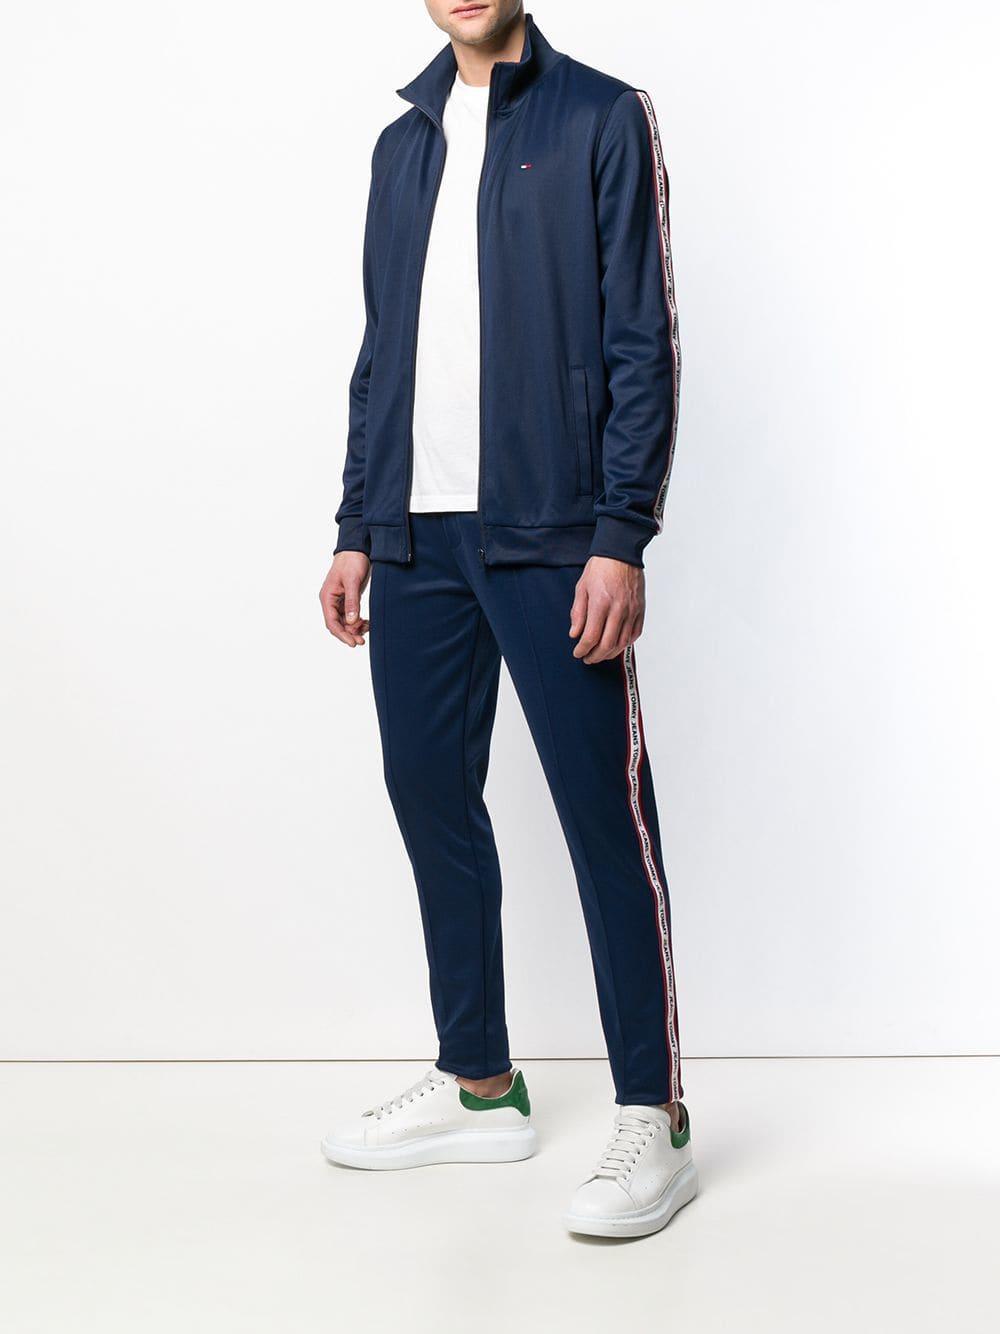 bffe290fc4abff Lyst - Tommy Hilfiger Logo Tape Track Pants in Blue for Men